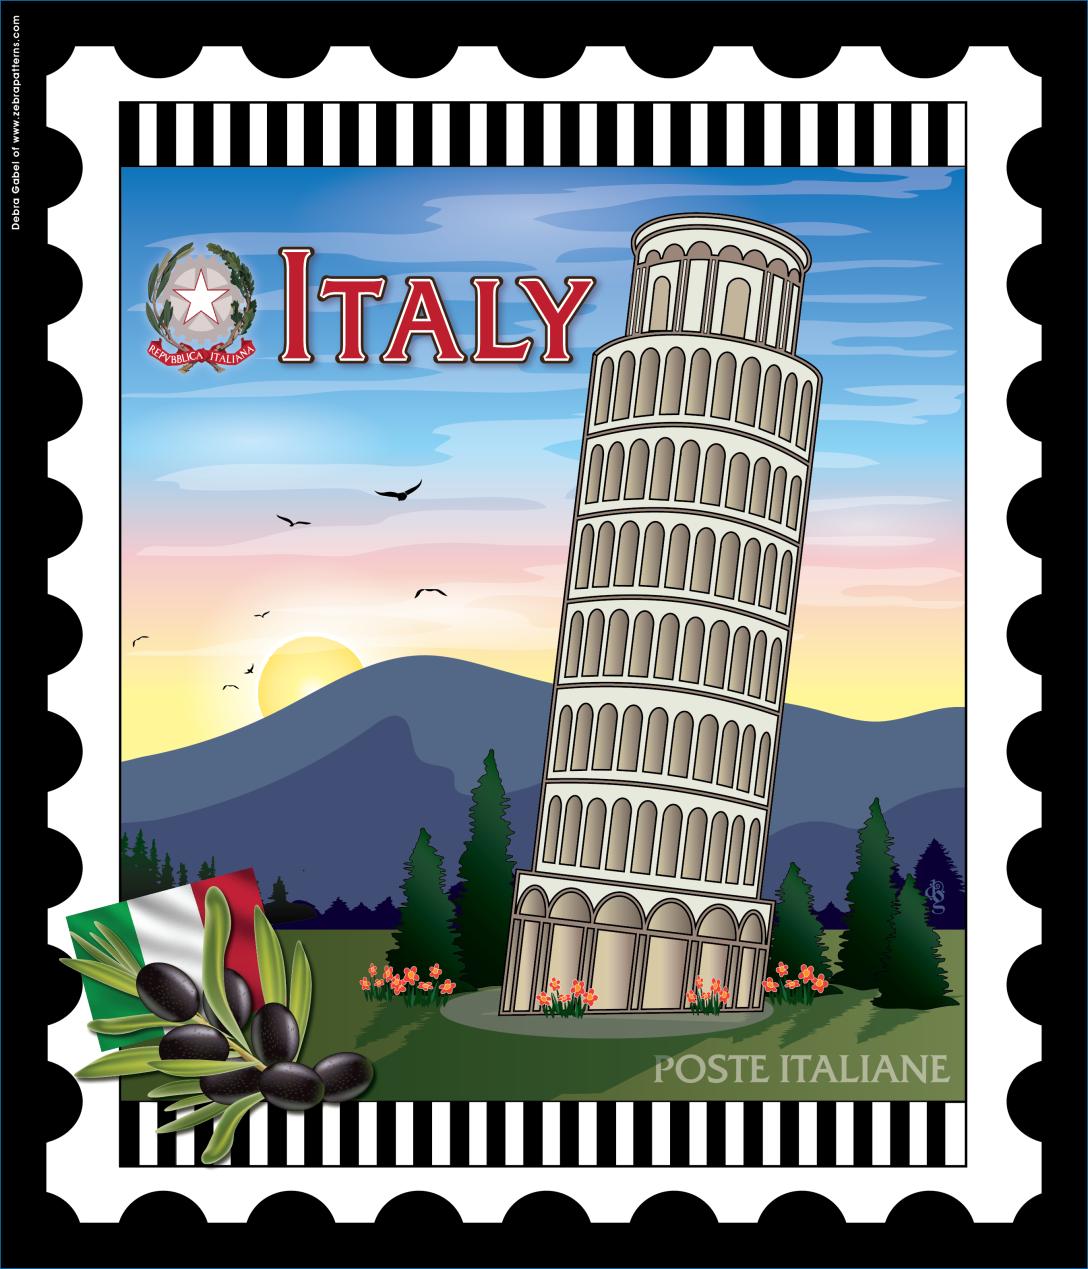 Italy Nationstamp Panel By Debra Gabel Of Www Zebrapatterns Com